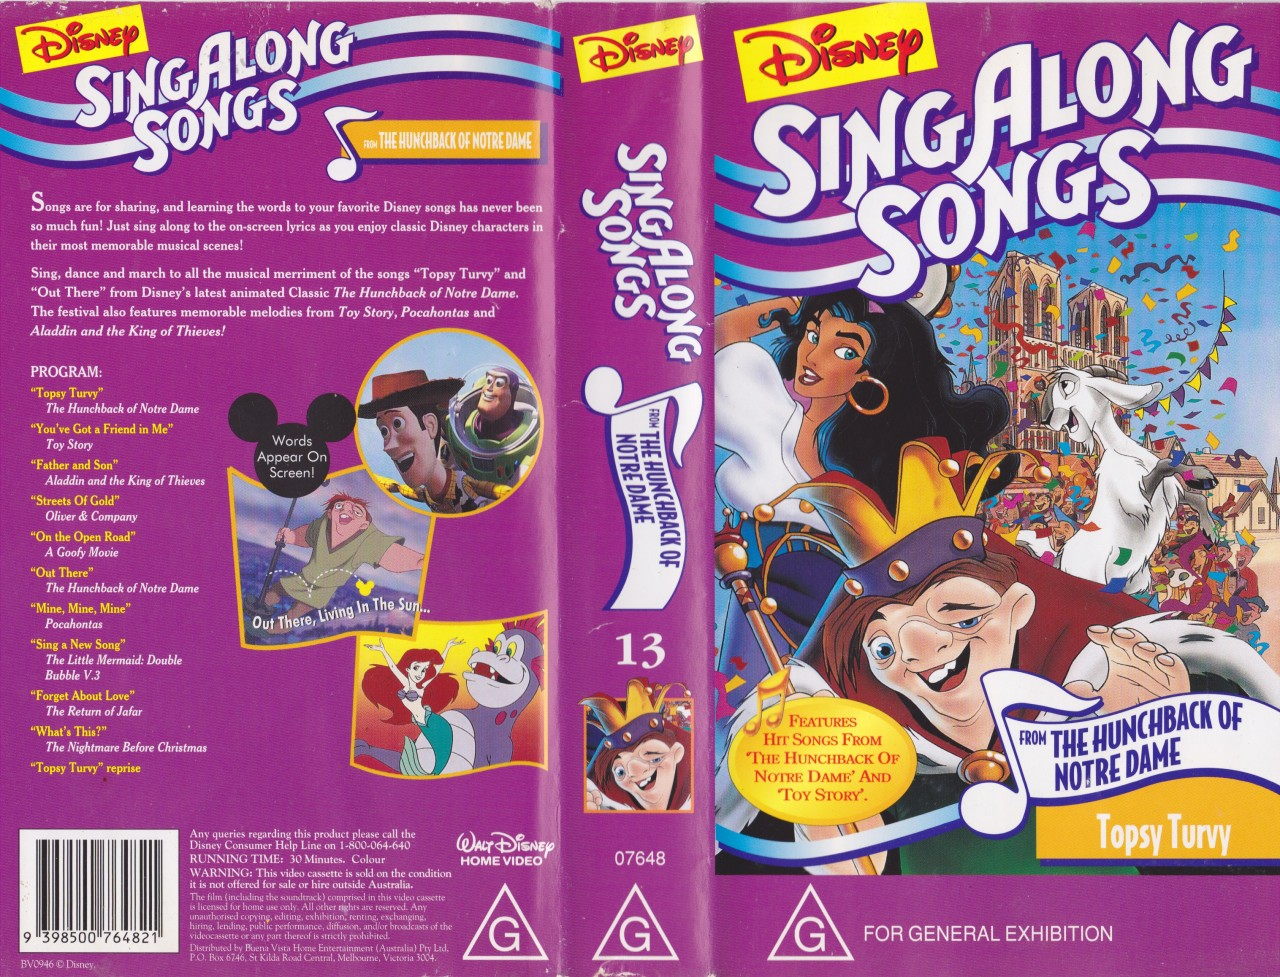 Disney Sing Along Songs Topsy Turvy Disney Wiki